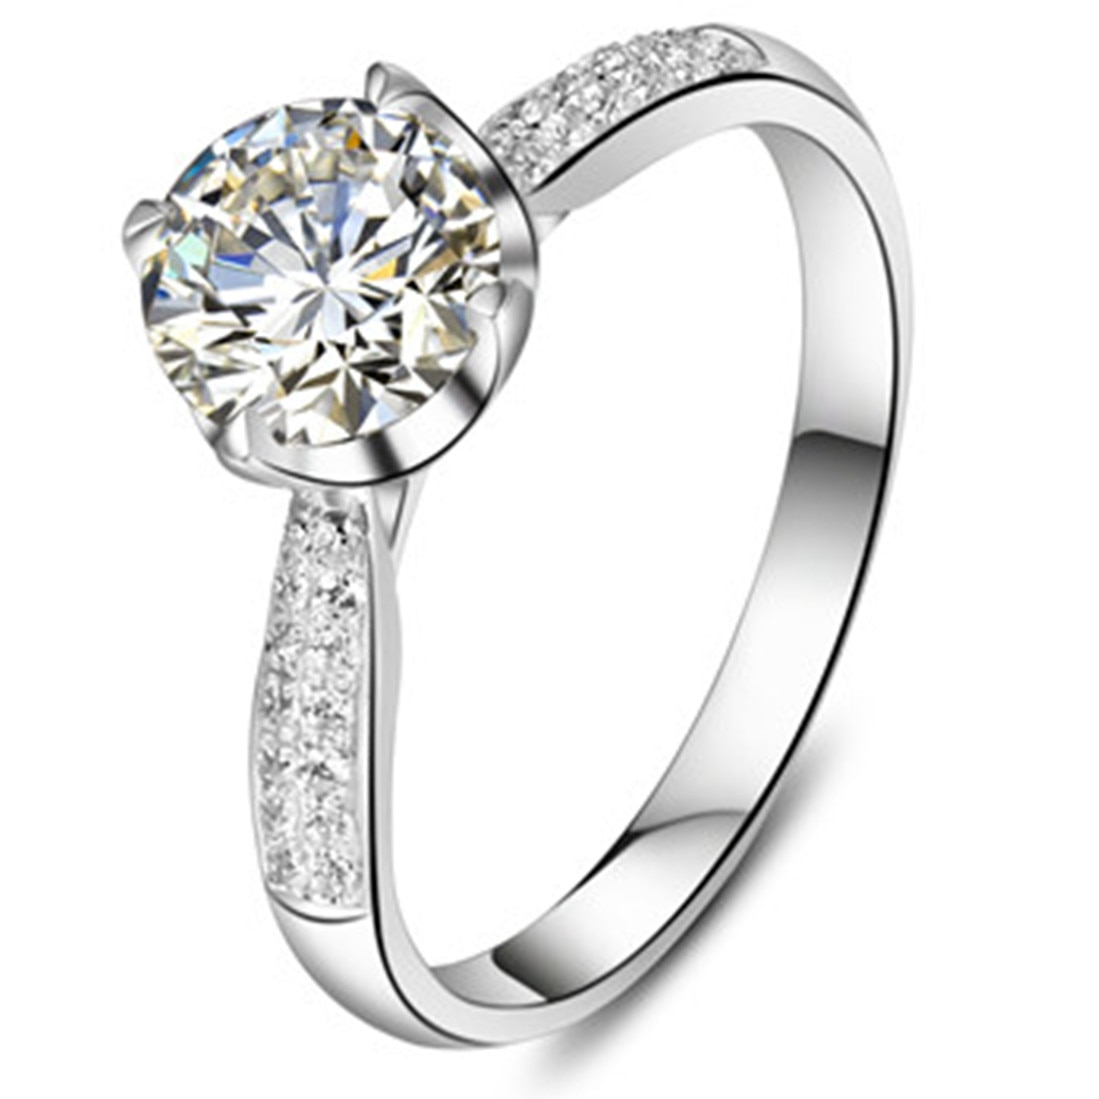 Anillo de diamante moissanita auténtico de oro blanco de 18 quilates, joyería positiva de compromiso para mujer, anillo de compromiso, anillo asequible de 18K con caja